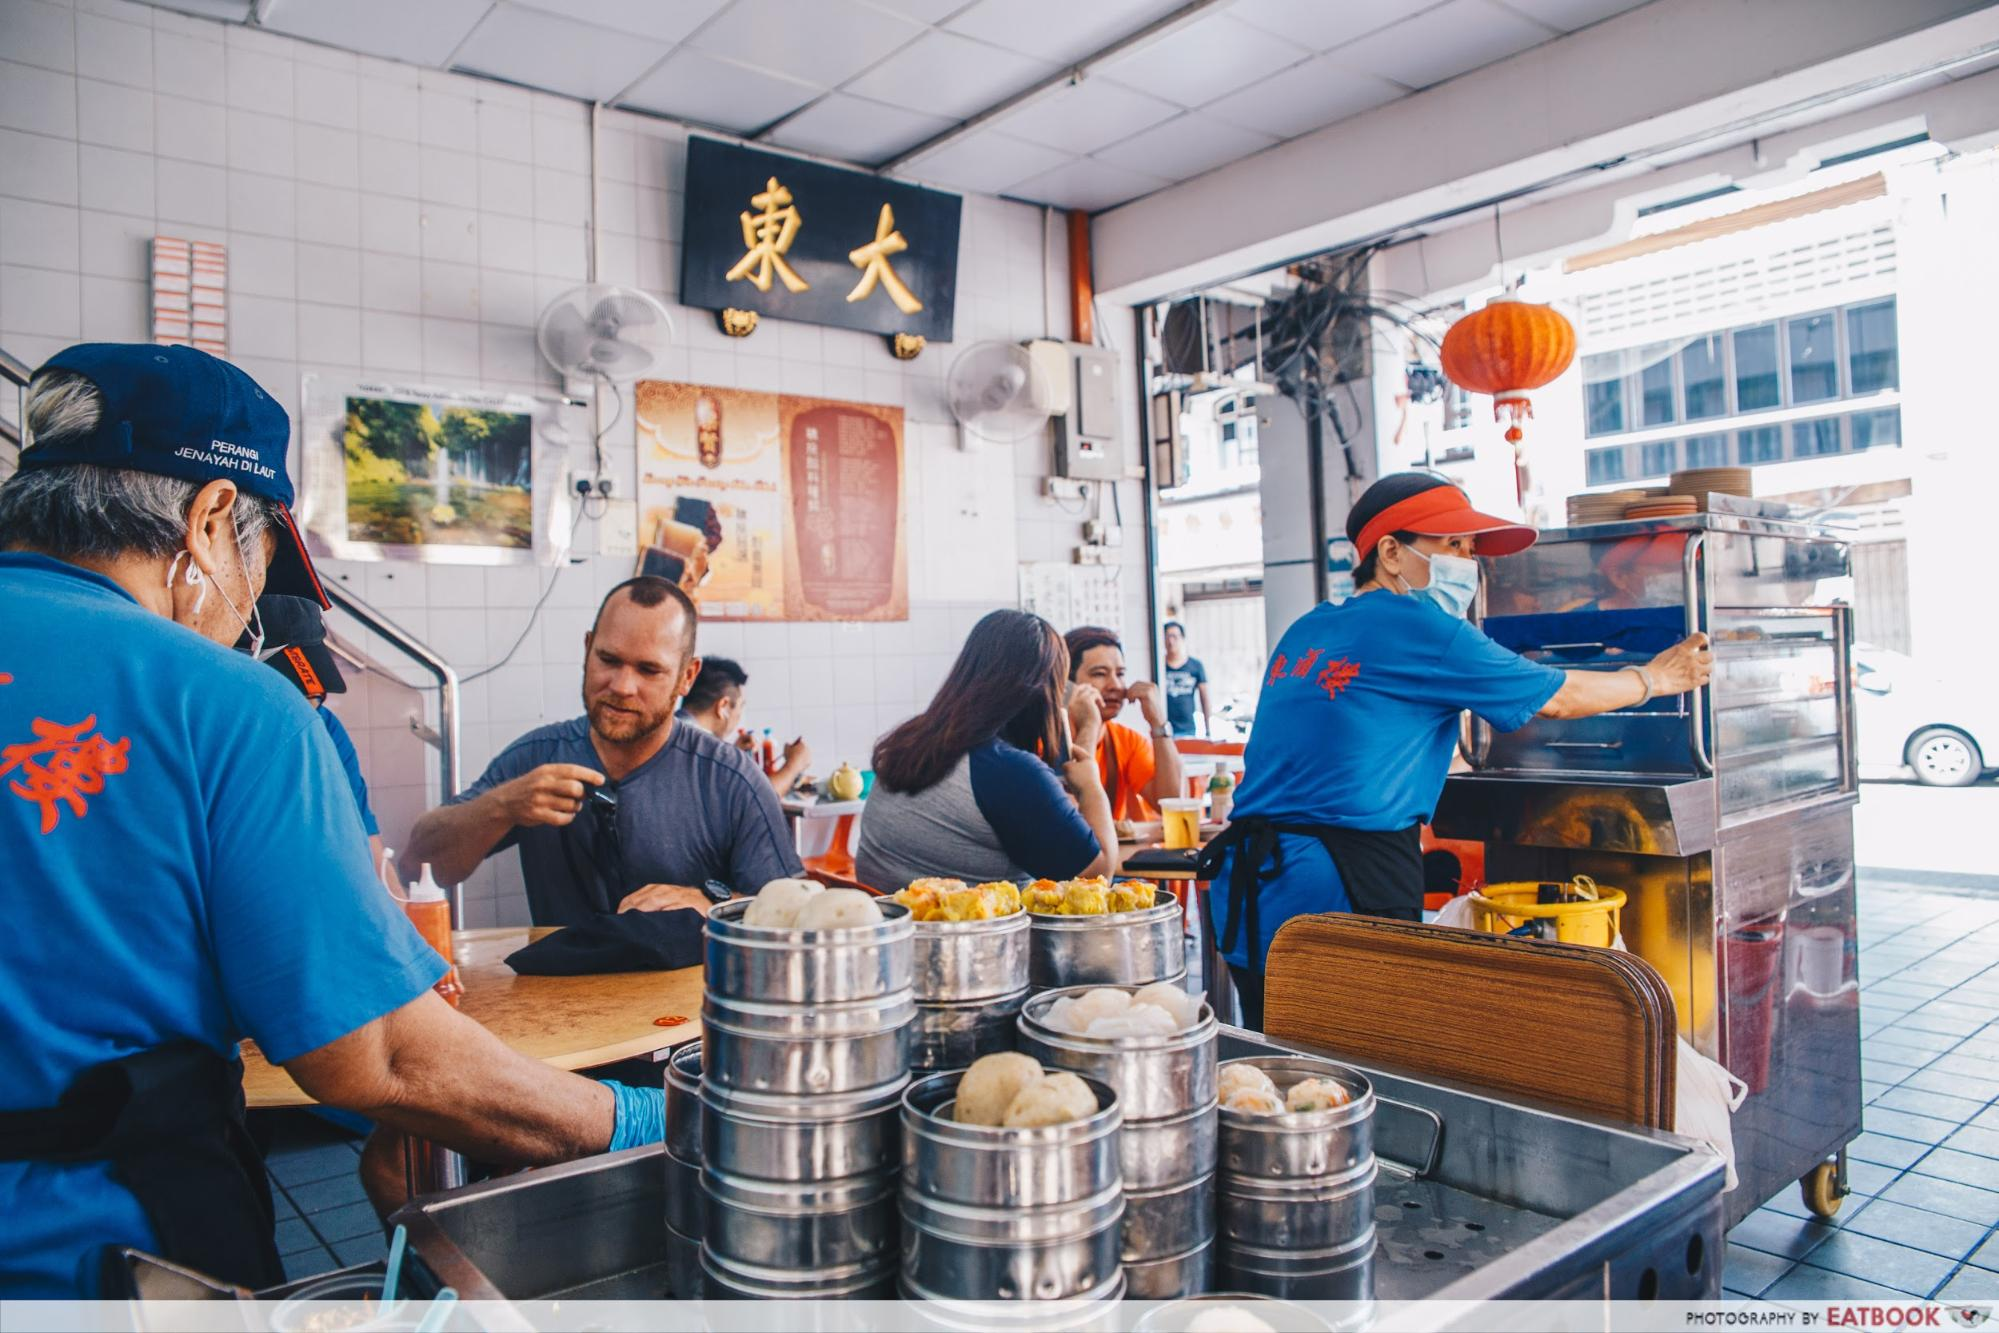 Penang Hawker Food - De Tai Tong Cafe